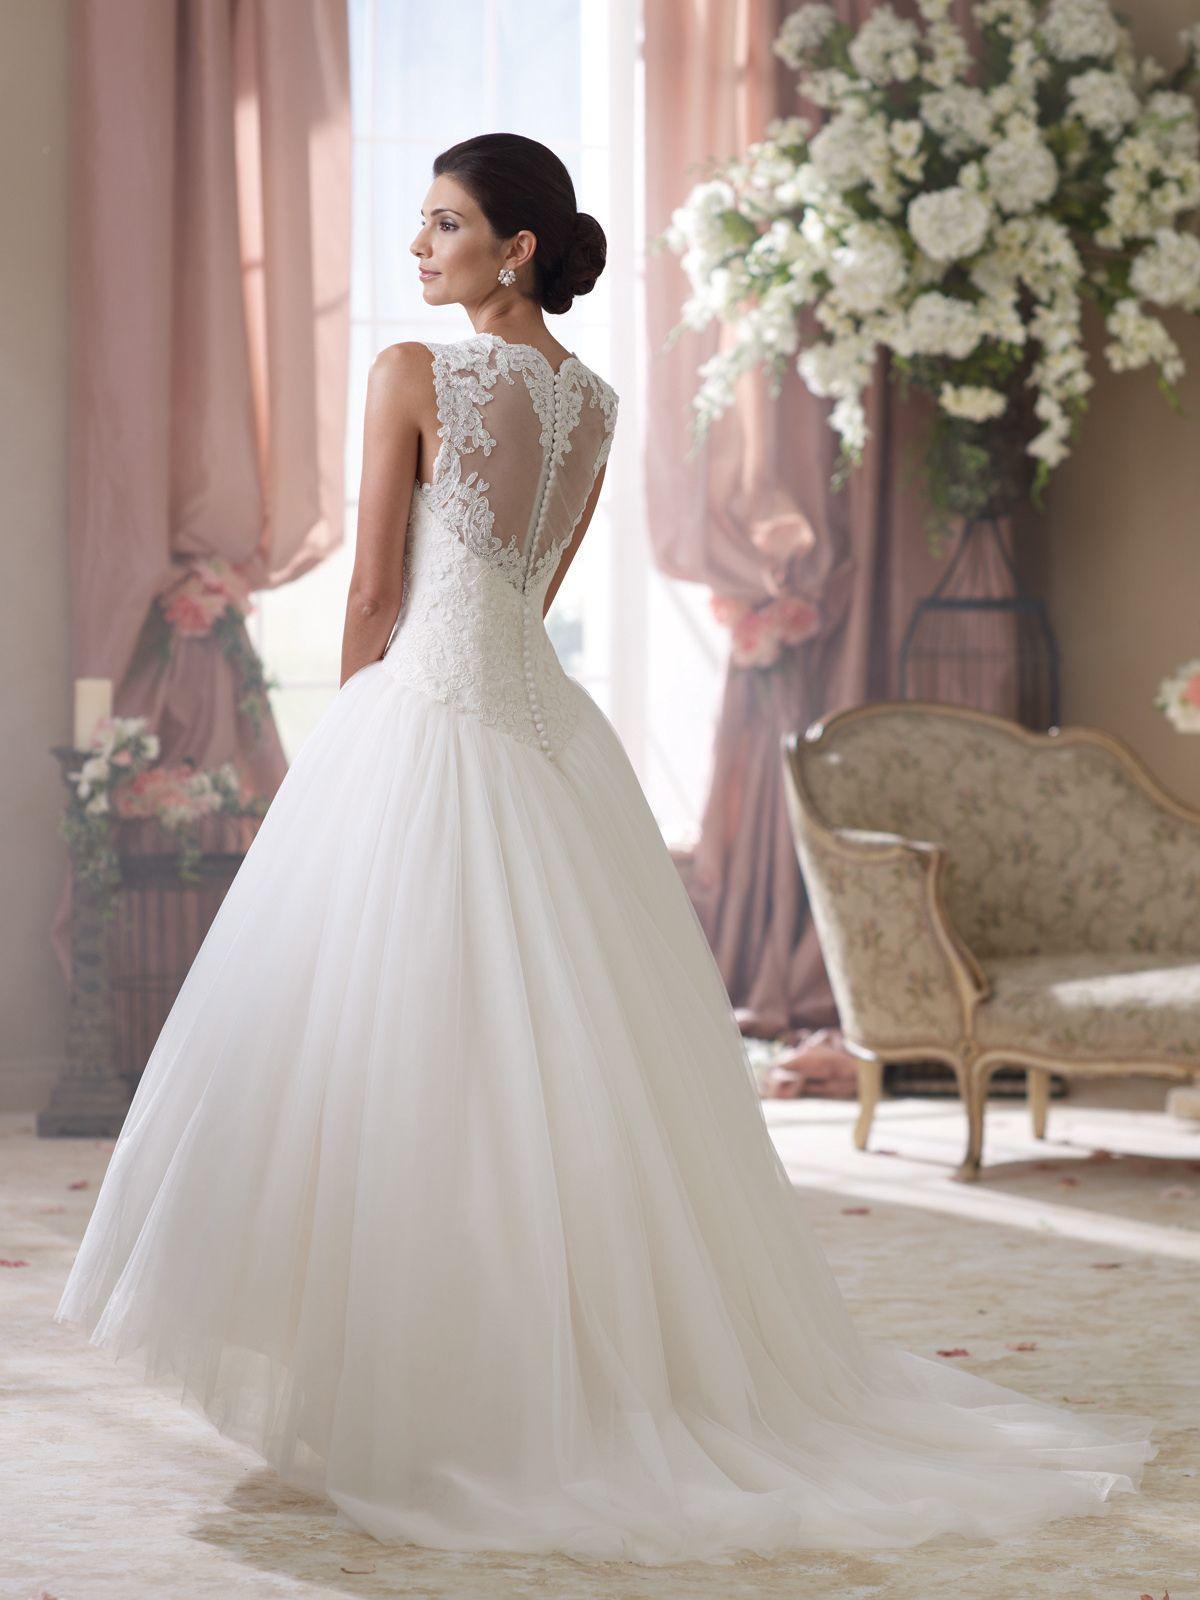 Martin Thornburg Wedding Dresses Bridal Gowns David Tutera Wedding Dresses Mon Cheri Wedding Dresses Trendy Wedding Dresses